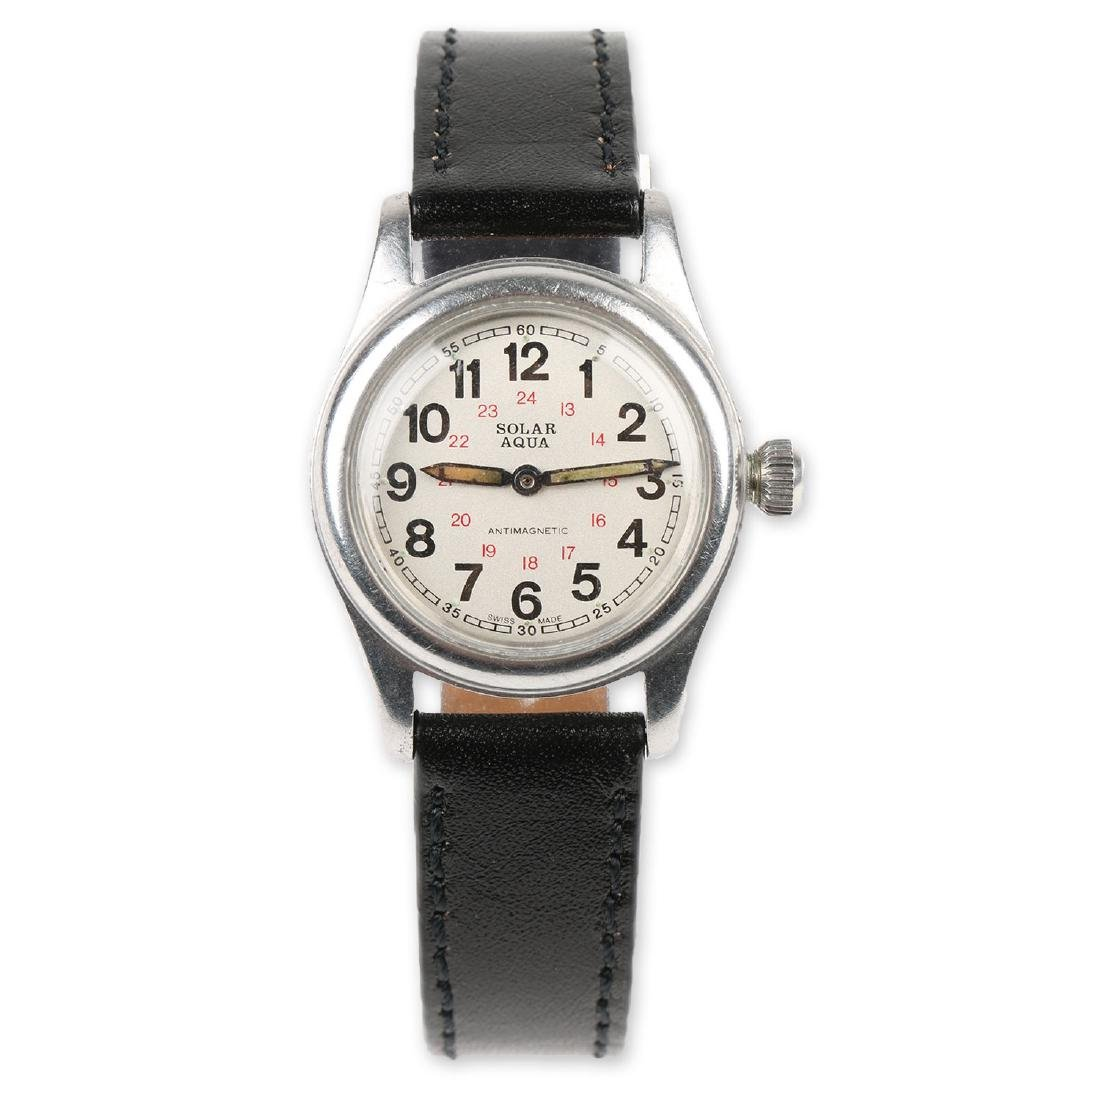 "WWII-Era Rolex Oyster ""Solar Aqua"" Wristwatch"